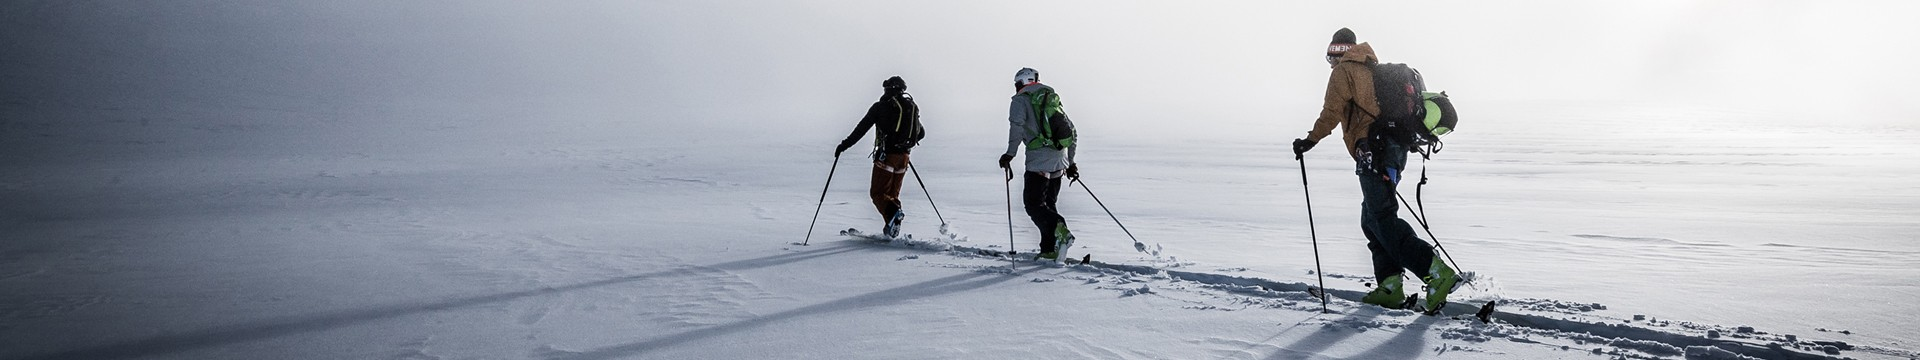 ski-rando-01-8788